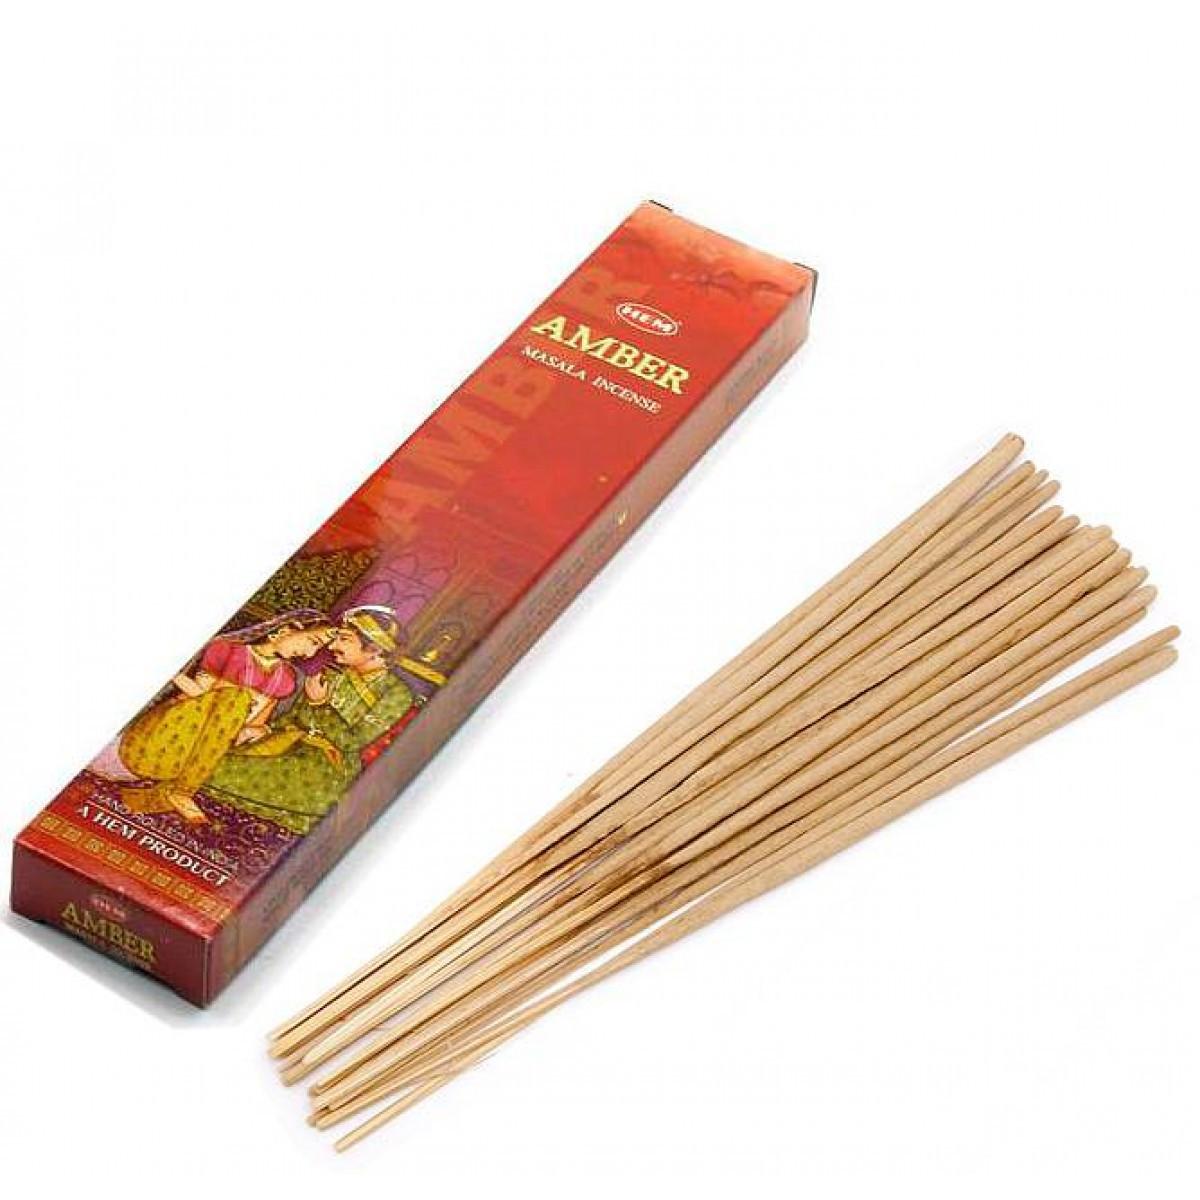 Amber Masala Small Box (Янтарь)(12/уп) (Hem) пыльцовое благовоние